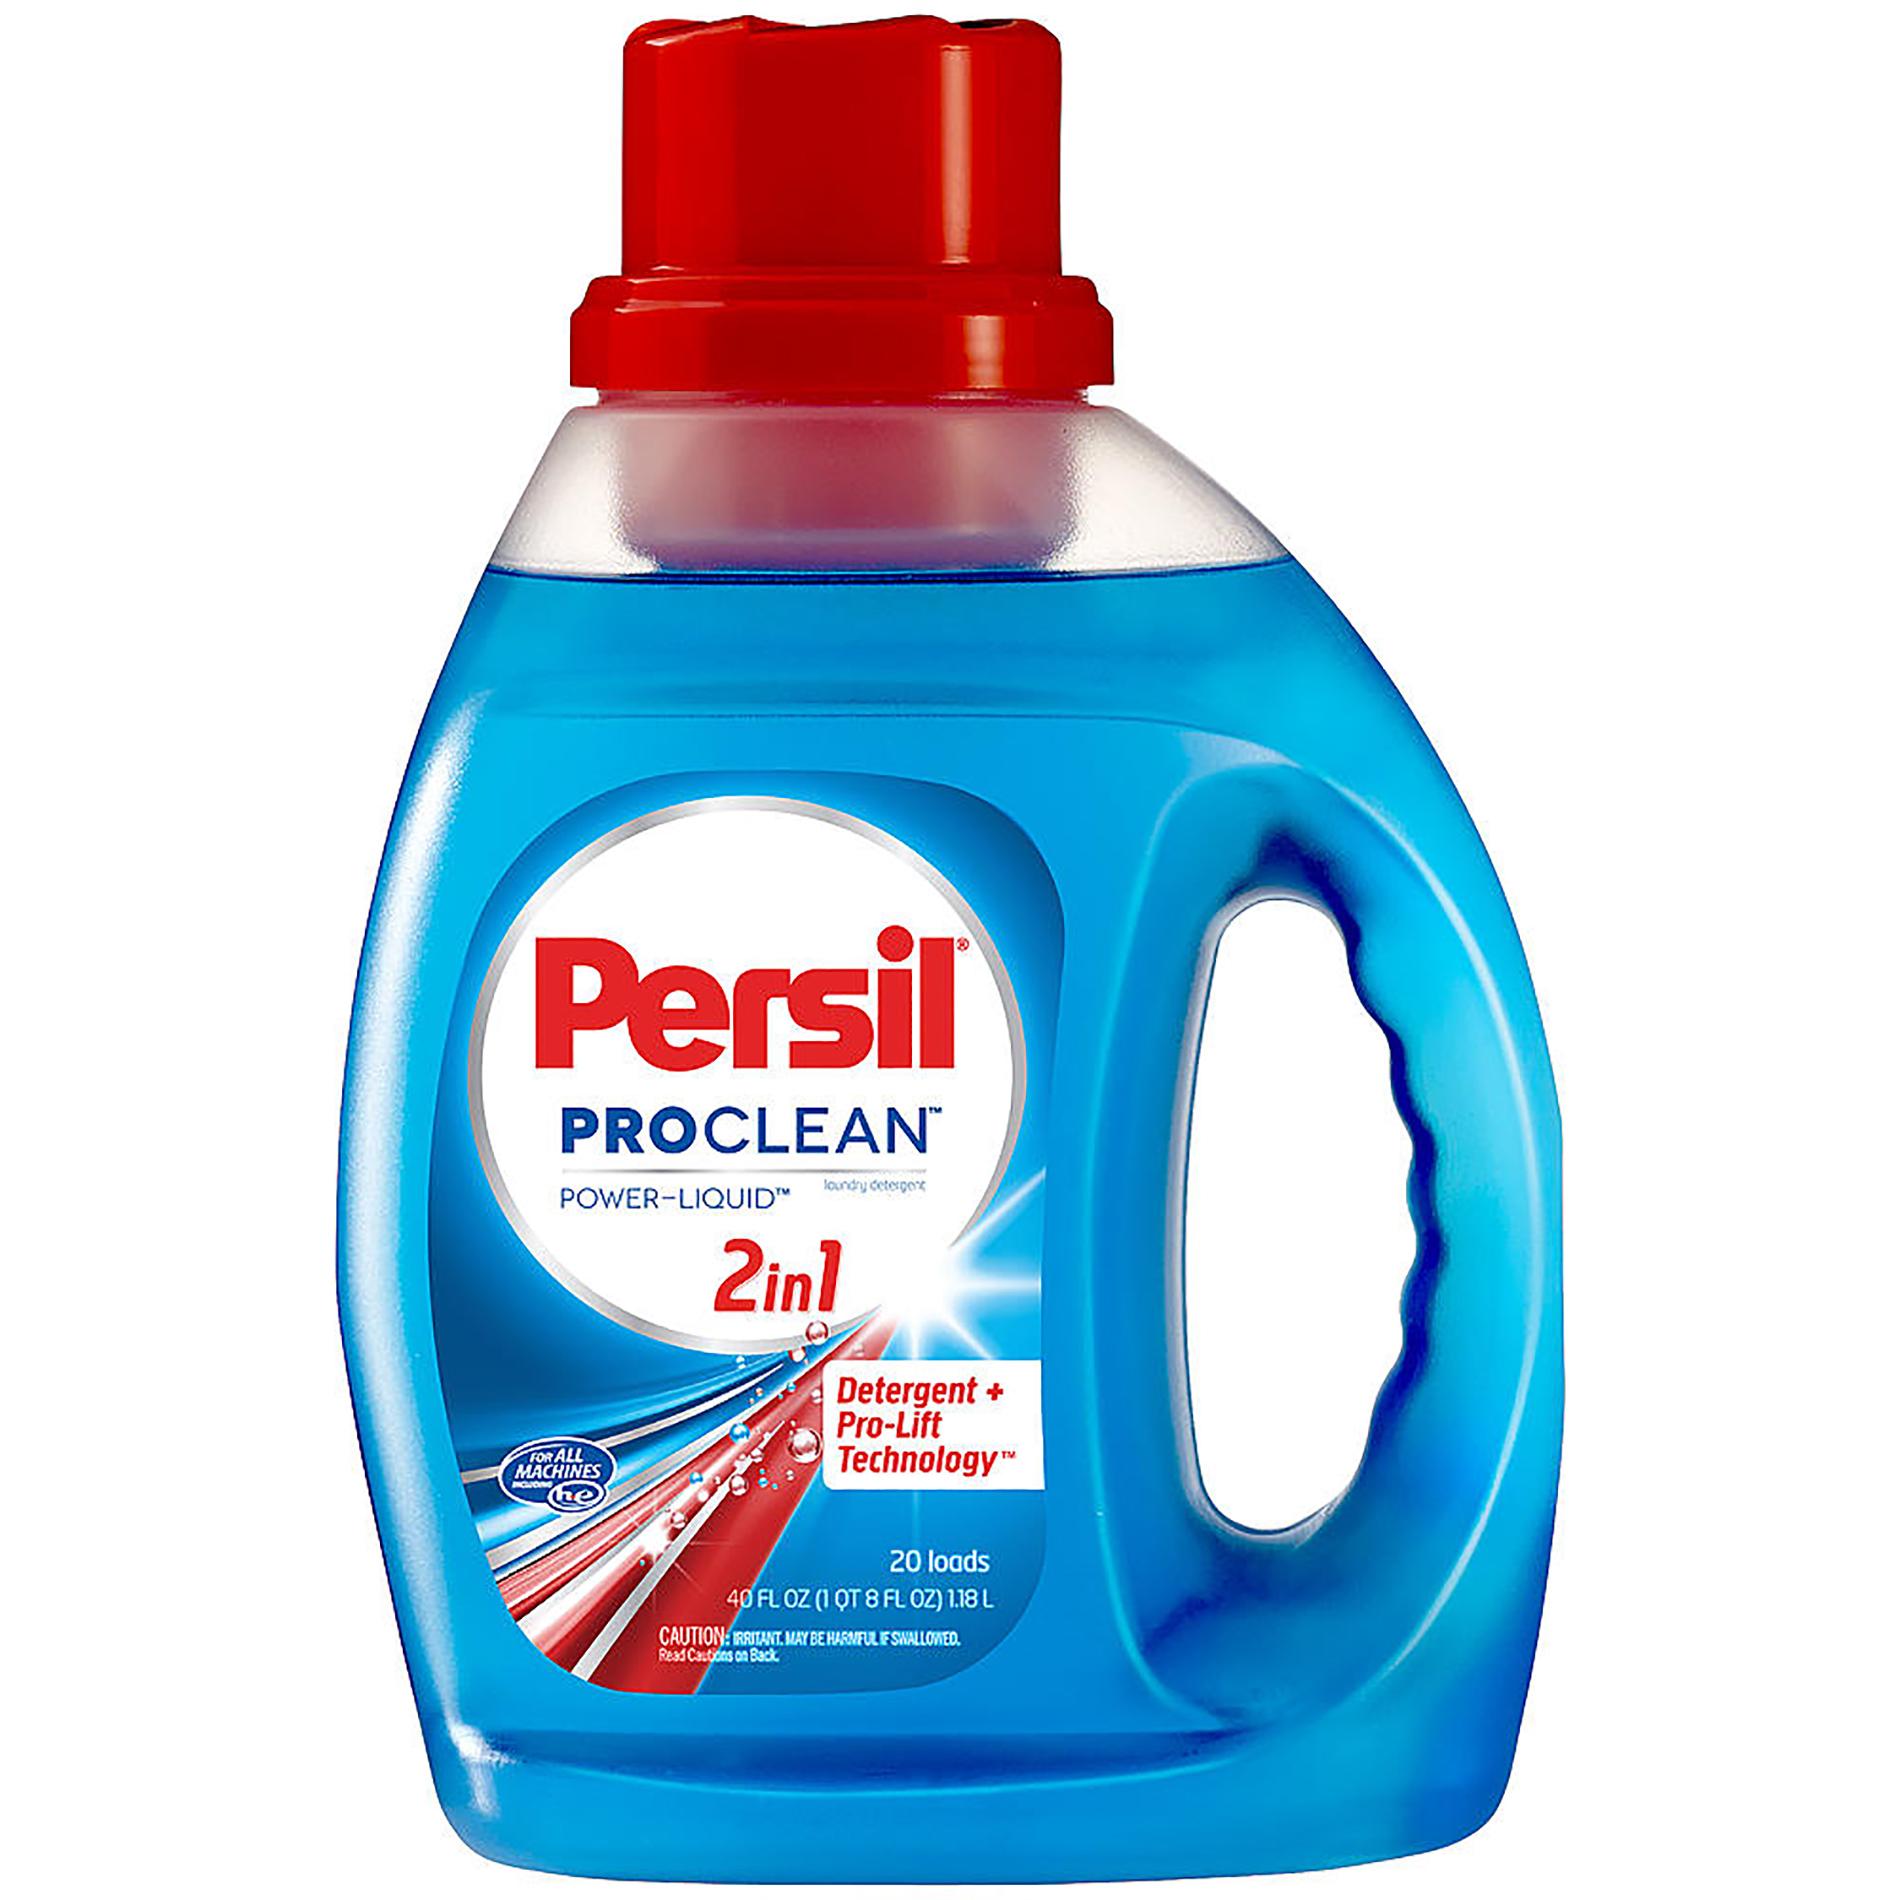 Persil ProClean Power-Liquid 2in1 Detergent 40 FL OZ JUG, Size: 40 oz